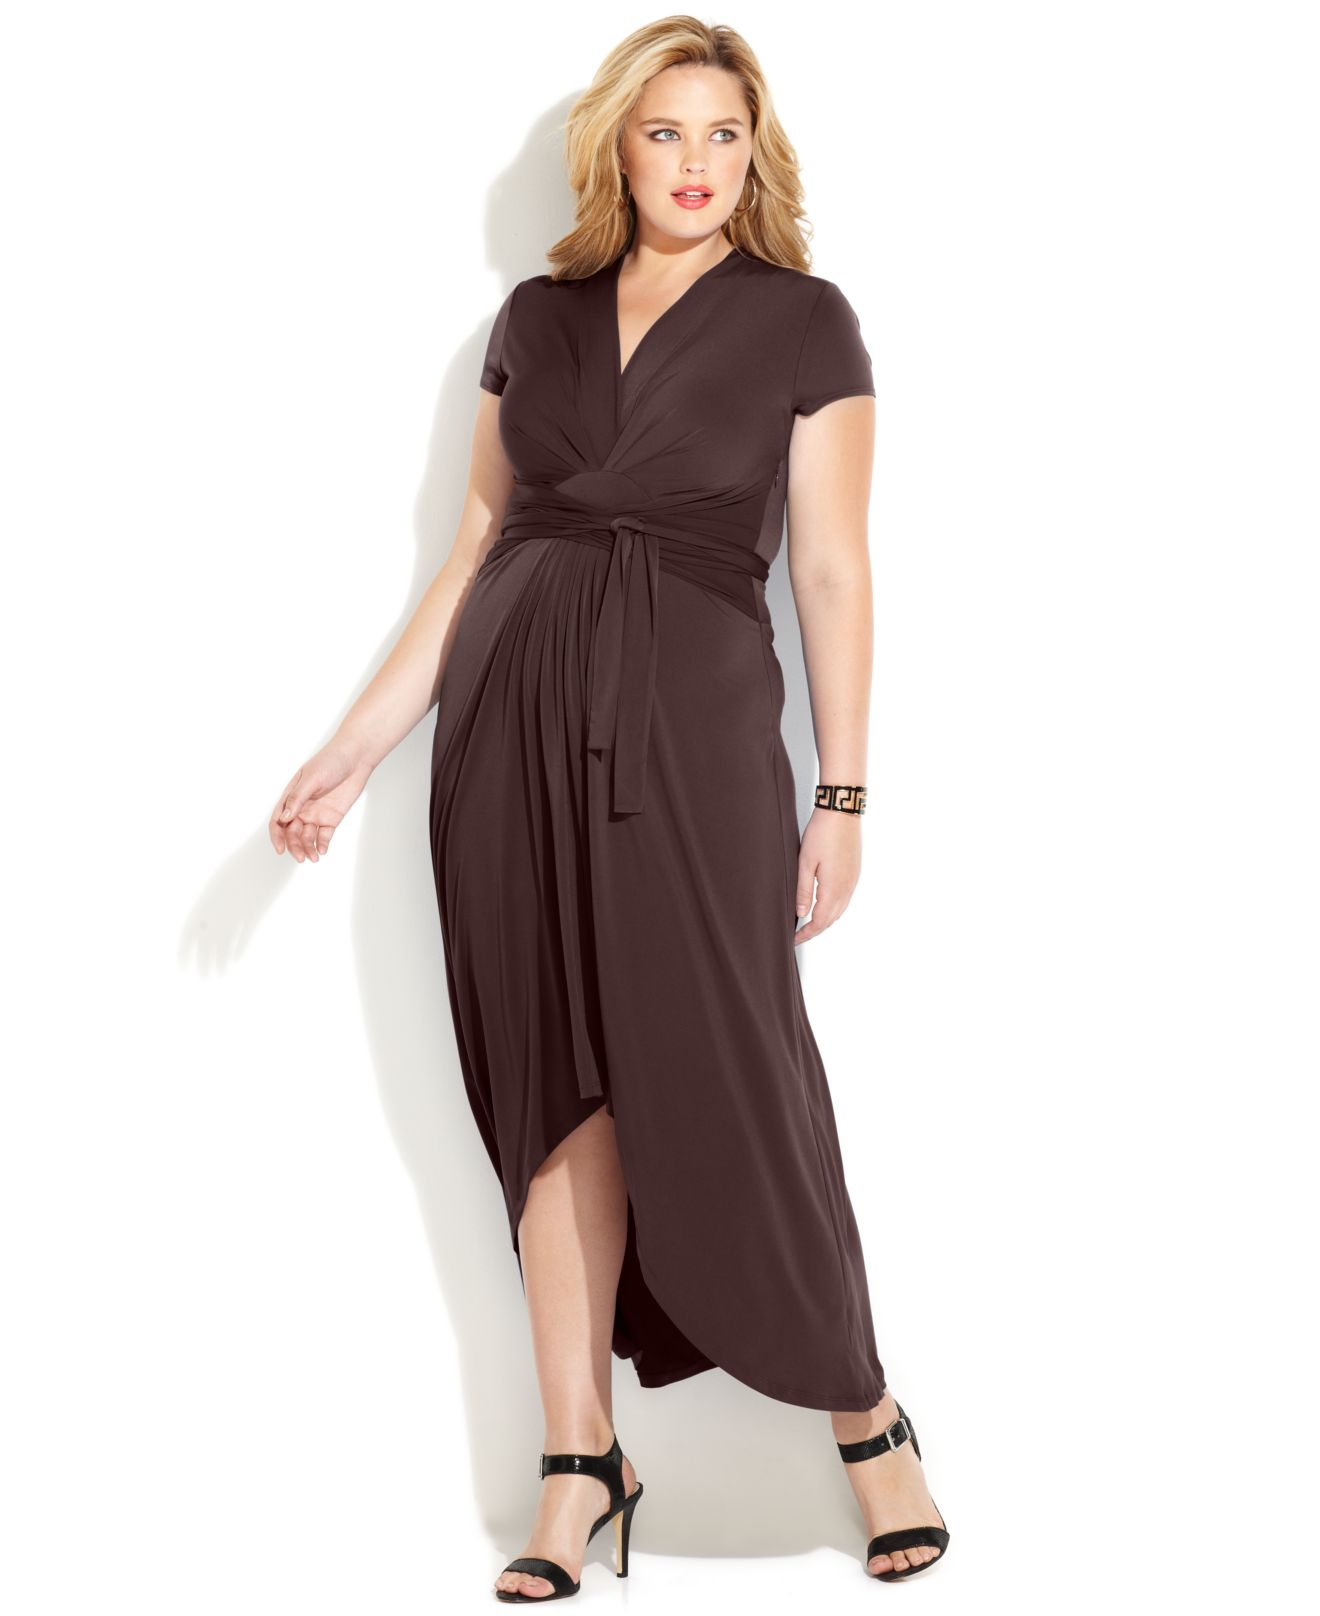 michael kors michael plus size fauxwrap maxi dress in brown | lyst